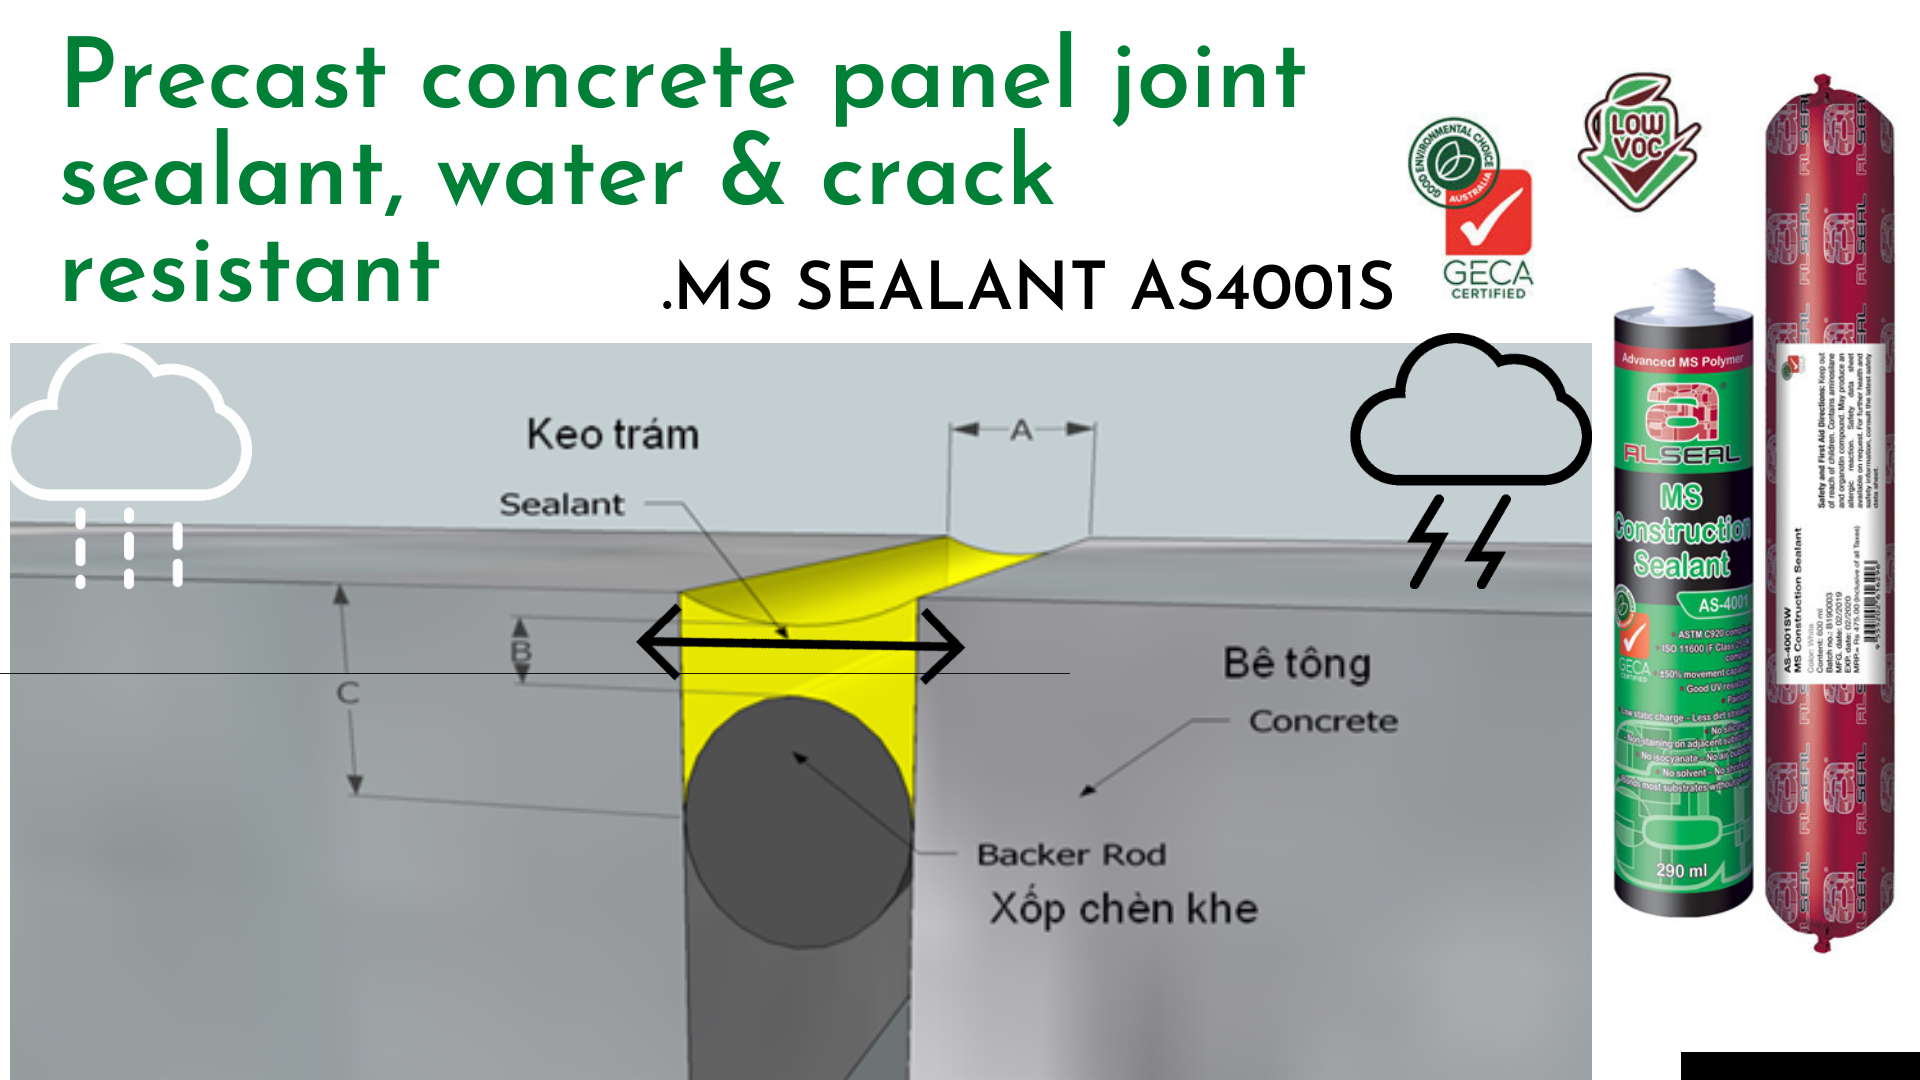 precast concrete panell joint sealant 1